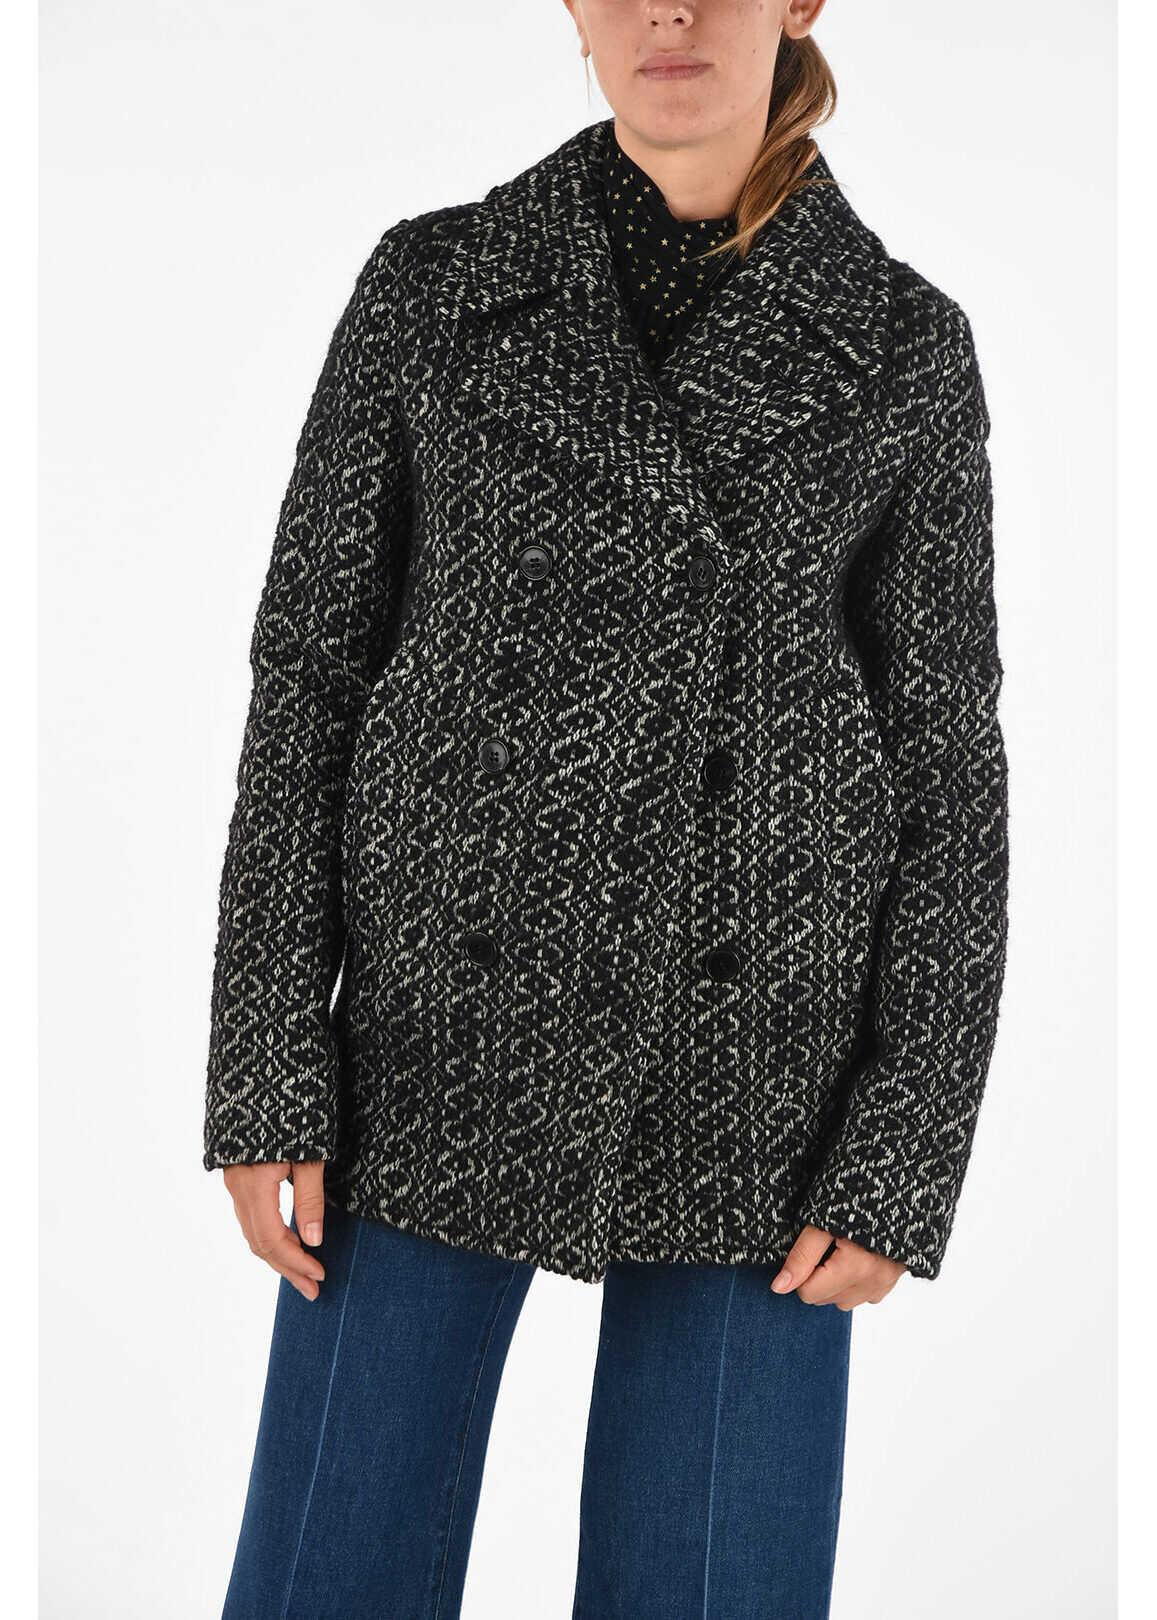 Saint Laurent Virgin Wool Double Breasted Coat BLACK & WHITE